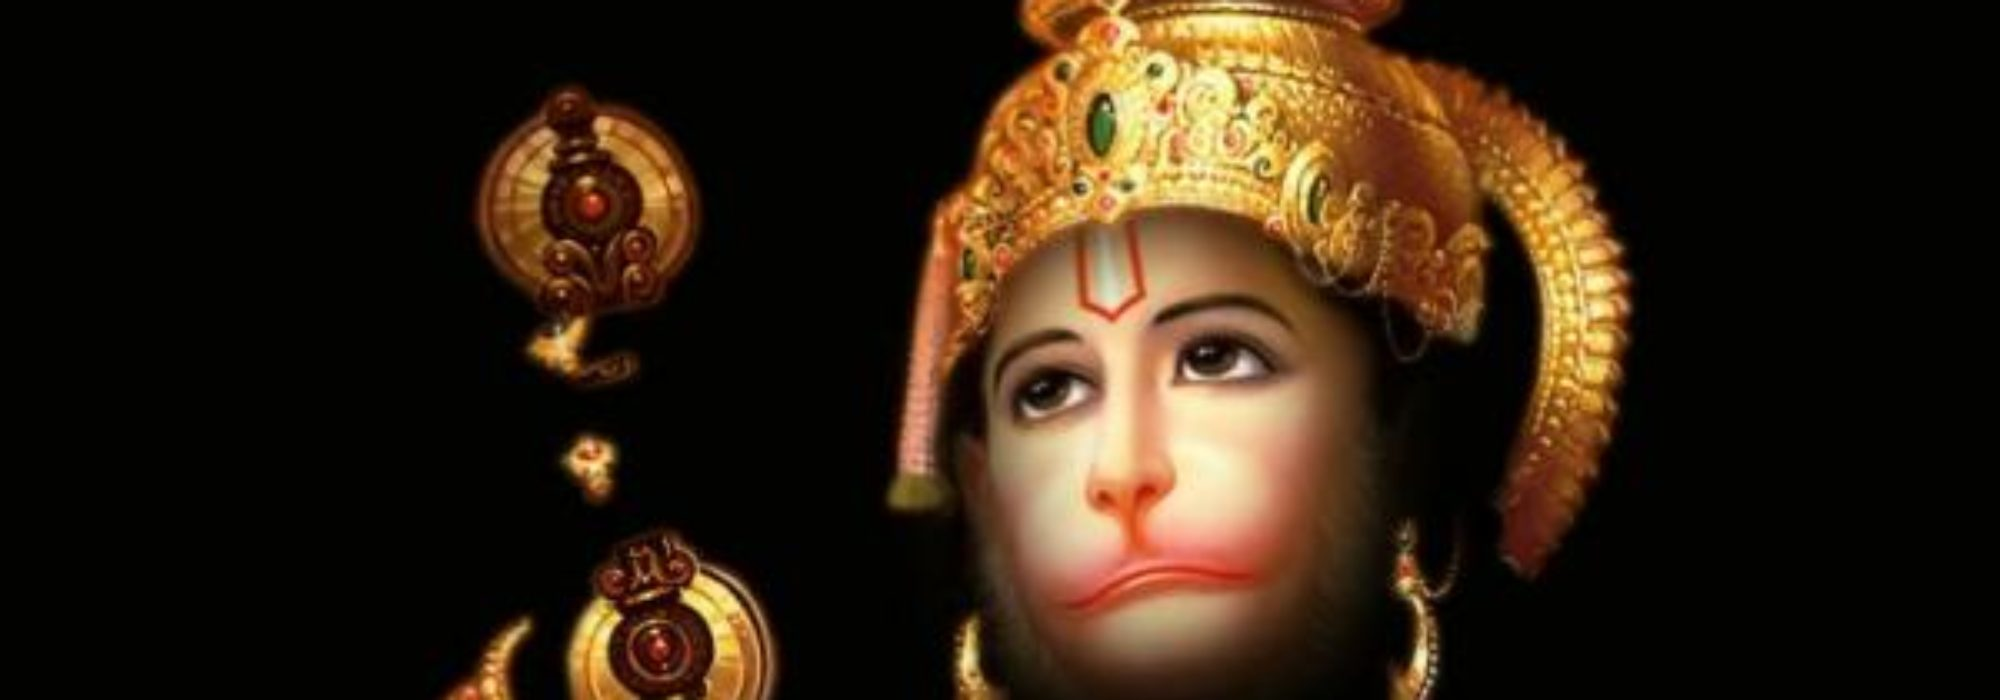 cropped-Hanuman-jee.jpg